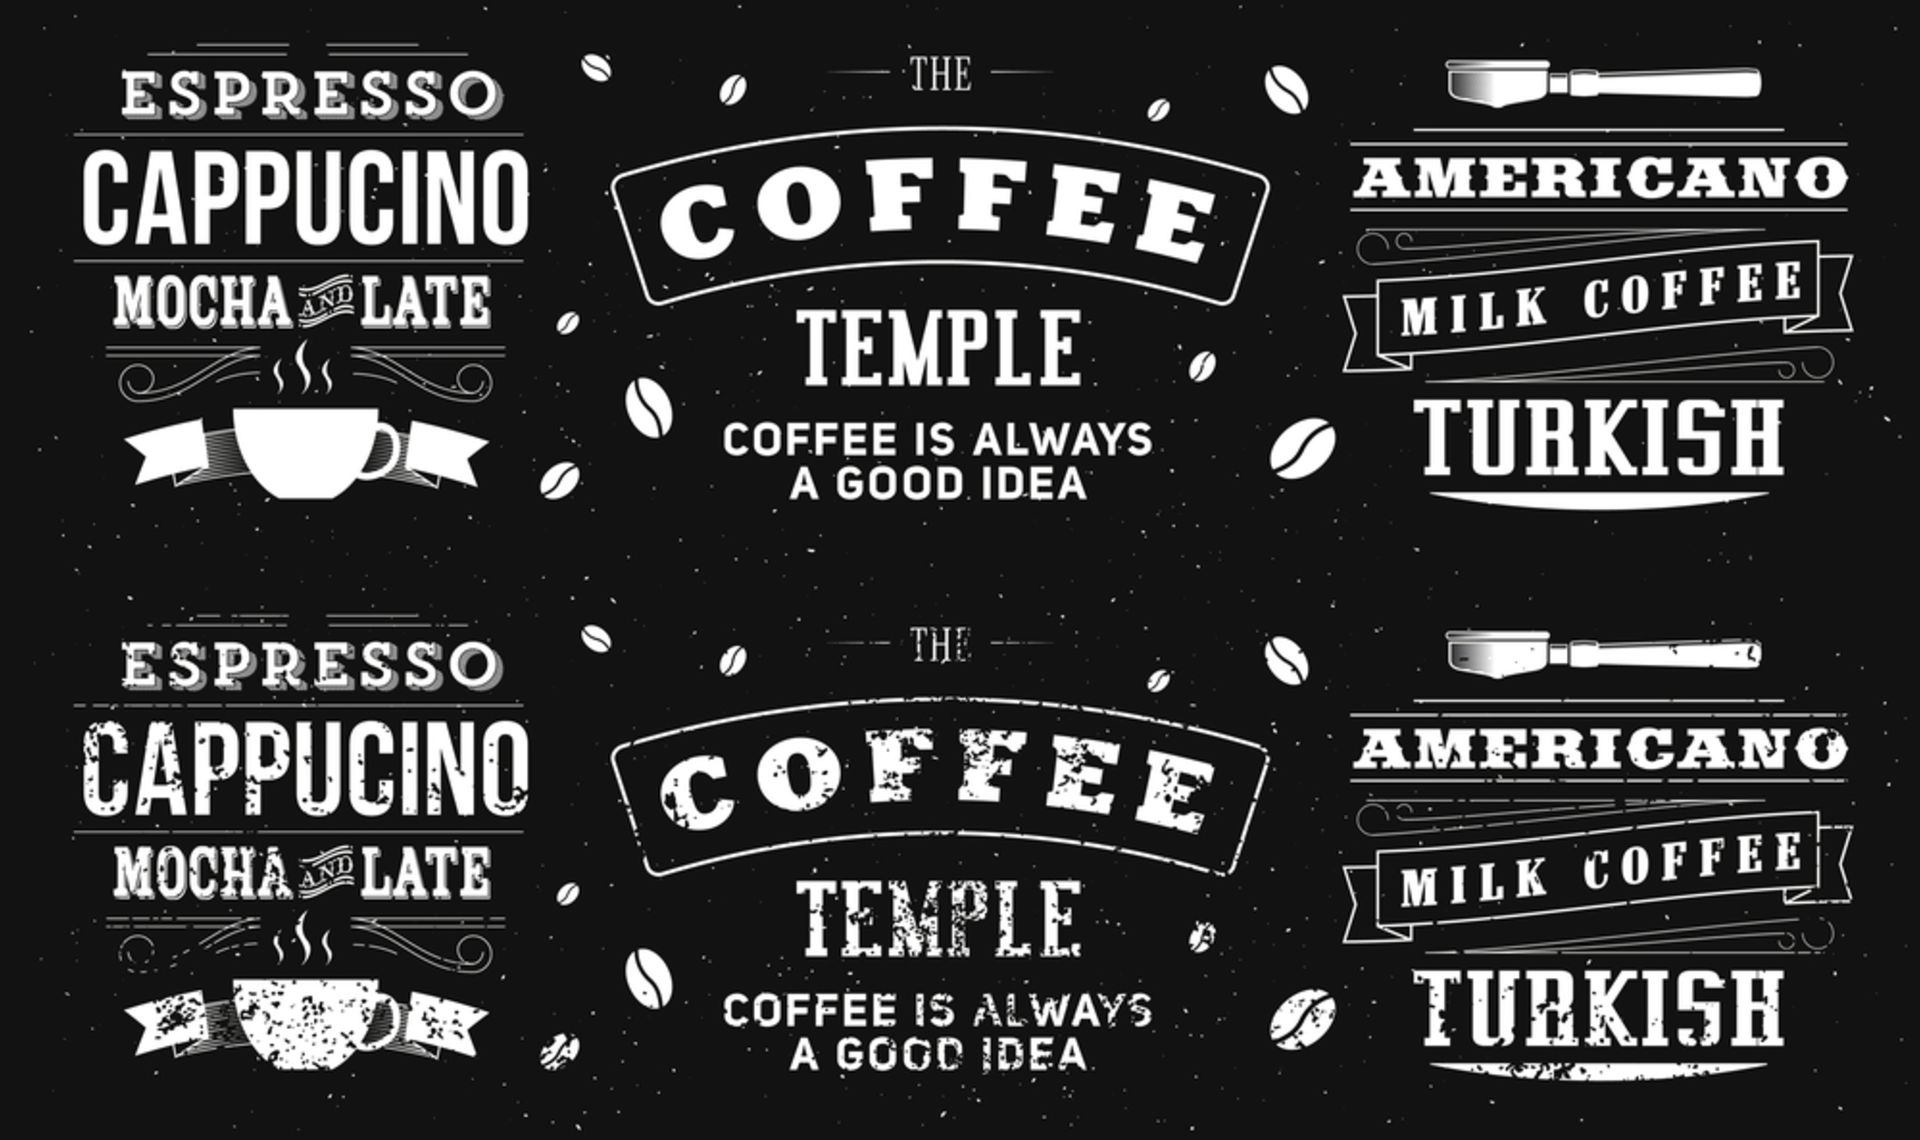 Best Coffee Shops in Town